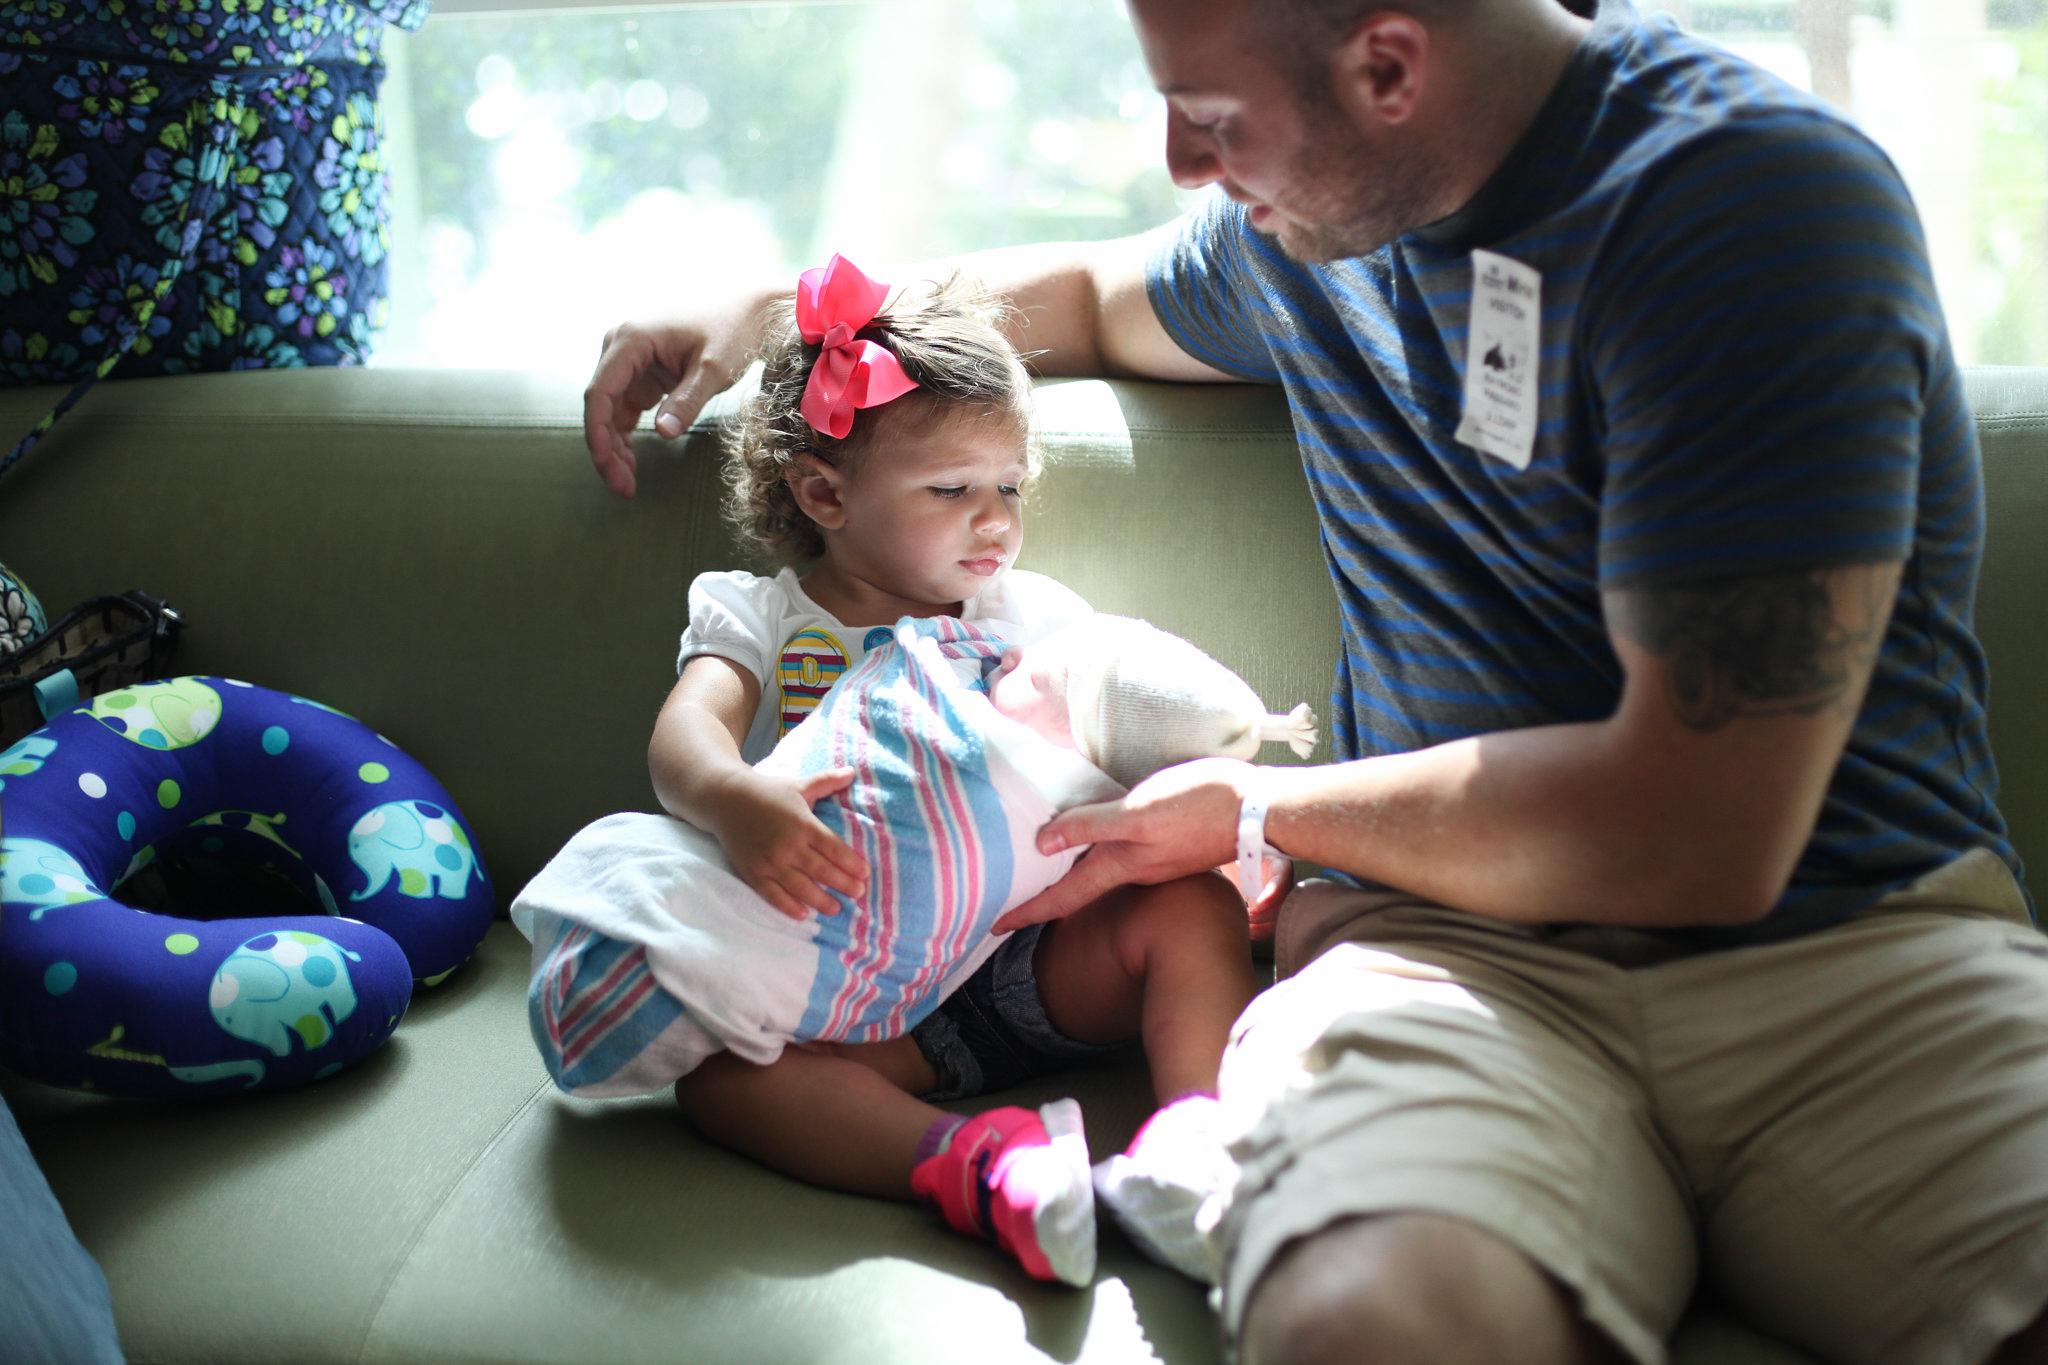 birth-center-hospital-photographer-photography-breastfeeding-south-florida-boca-regional-delray-palms-hollywood-pumping-water-natural-family-newborn-41.jpg